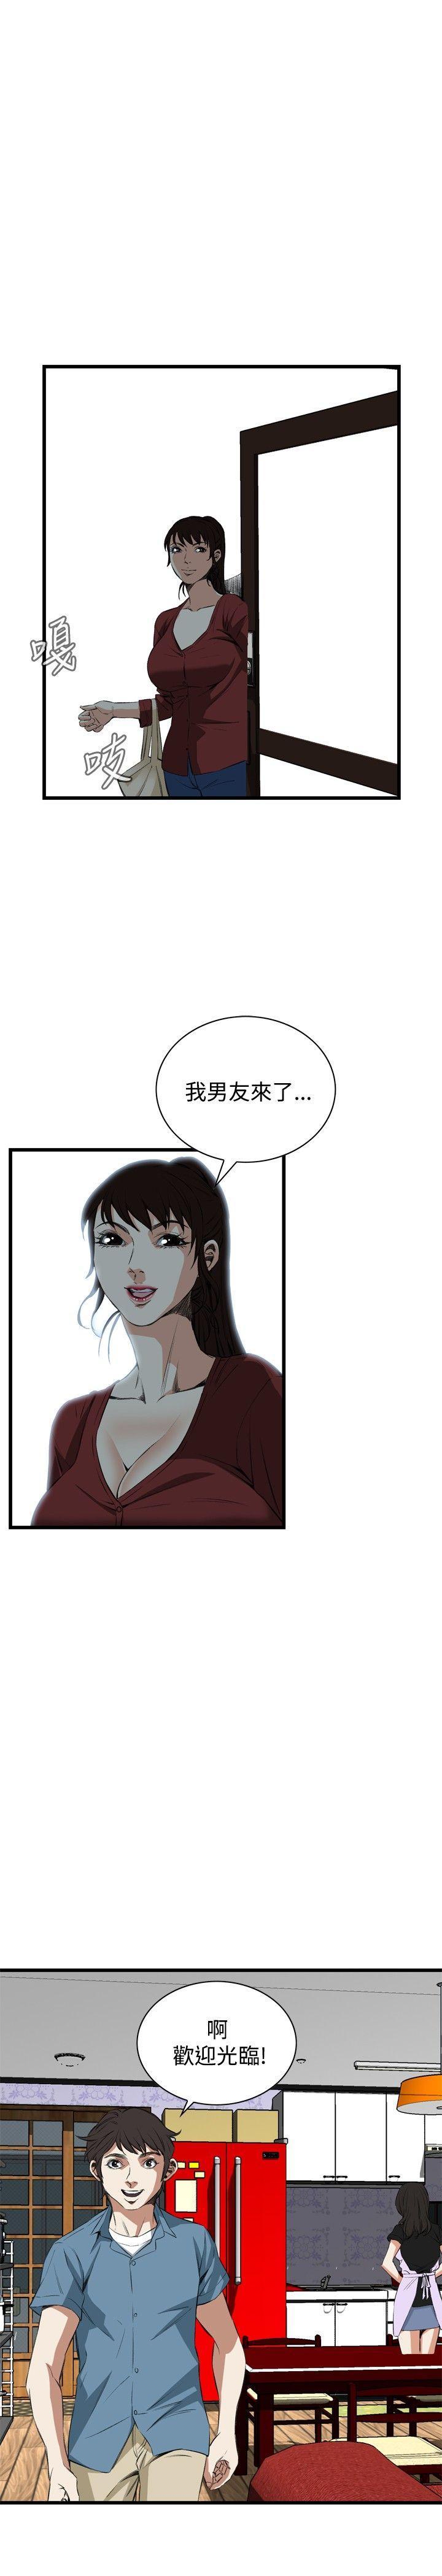 Take a Peek 偷窥 Ch.39~60 [Chinese]中文 531